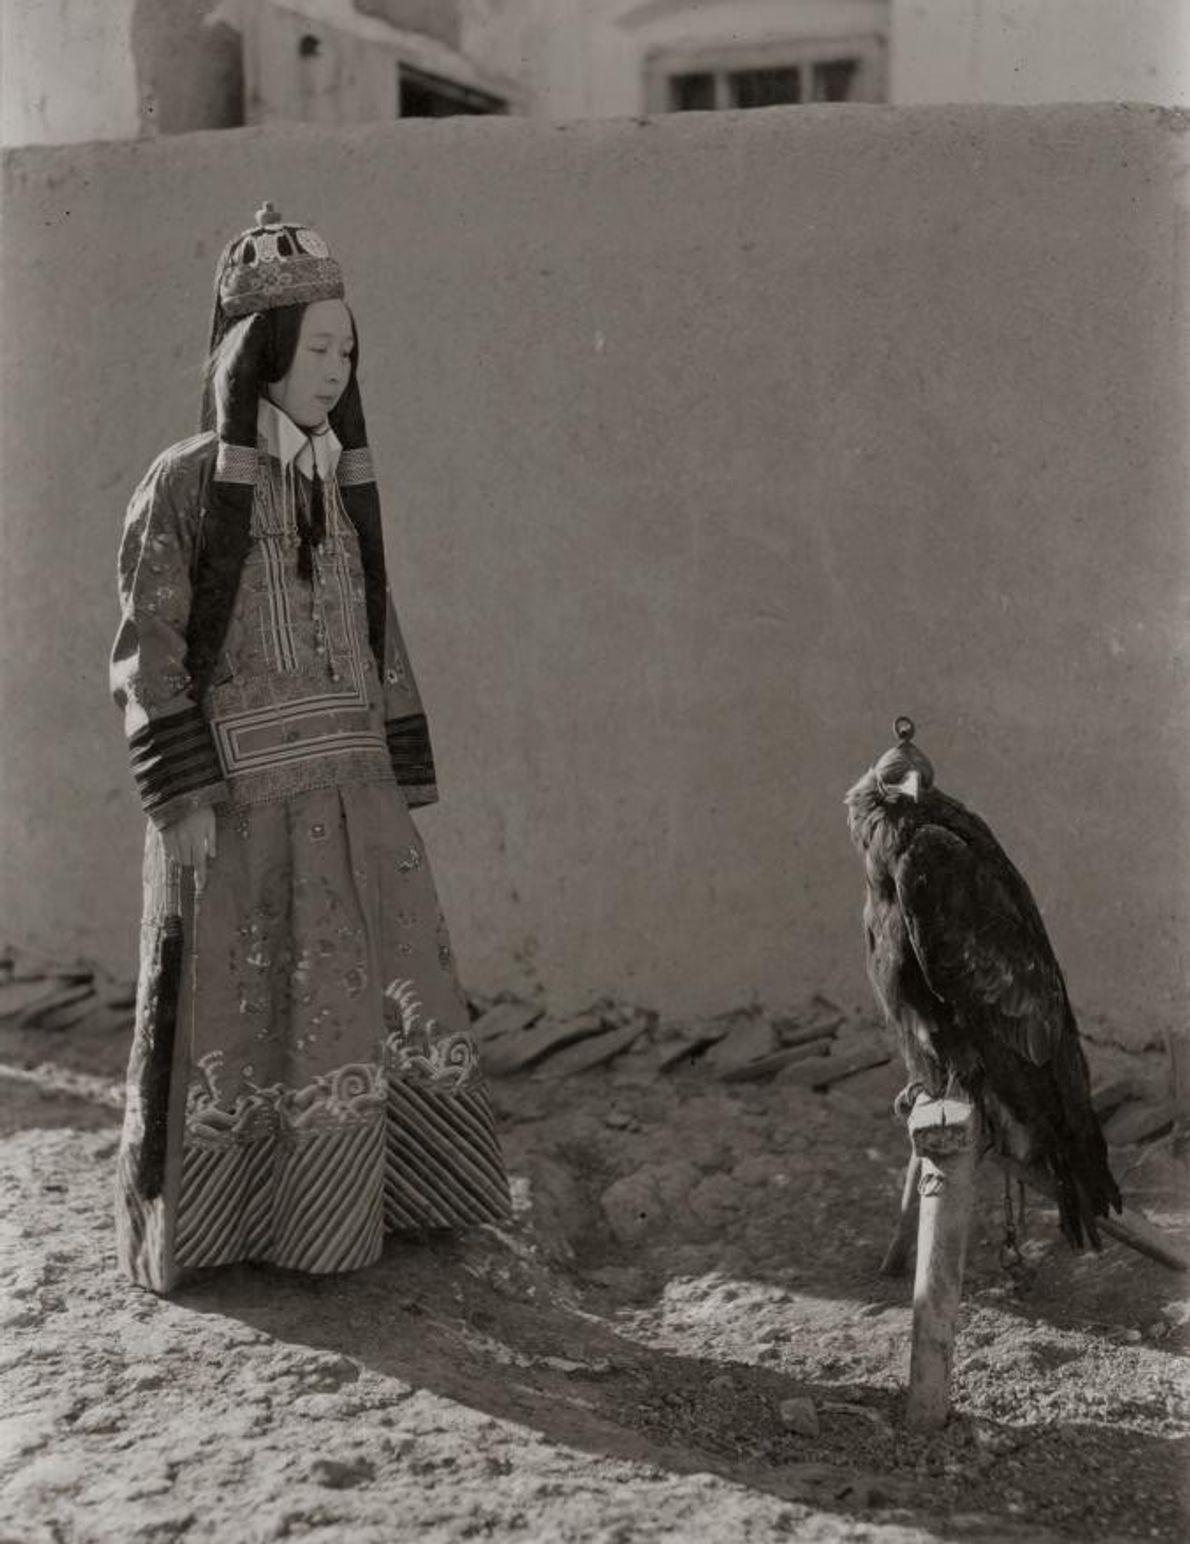 A princesa chinesa Nirgidma observa a sua águia, em 1932.